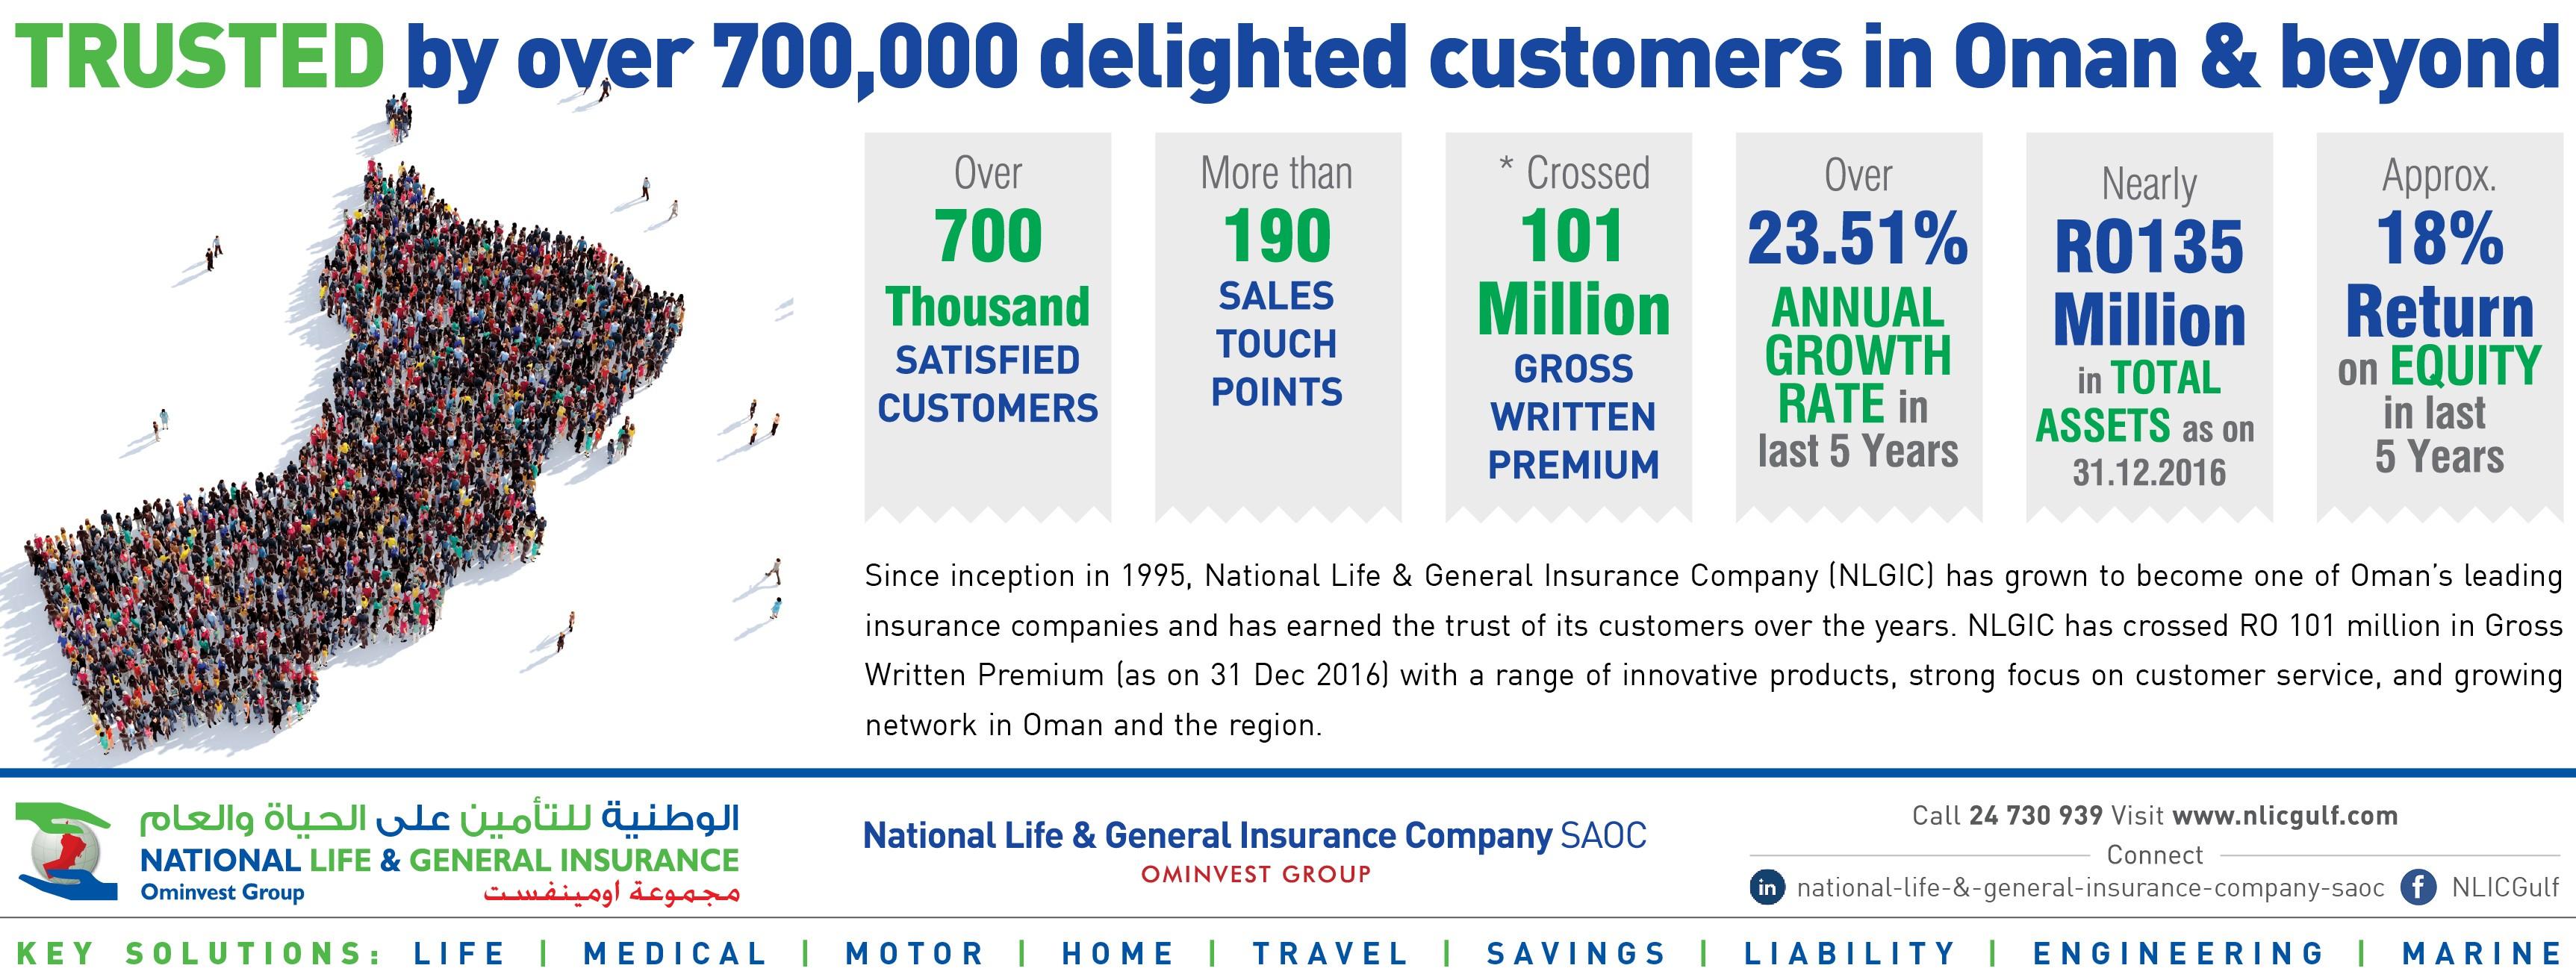 National Life & General Insurance Company SAOG | LinkedIn